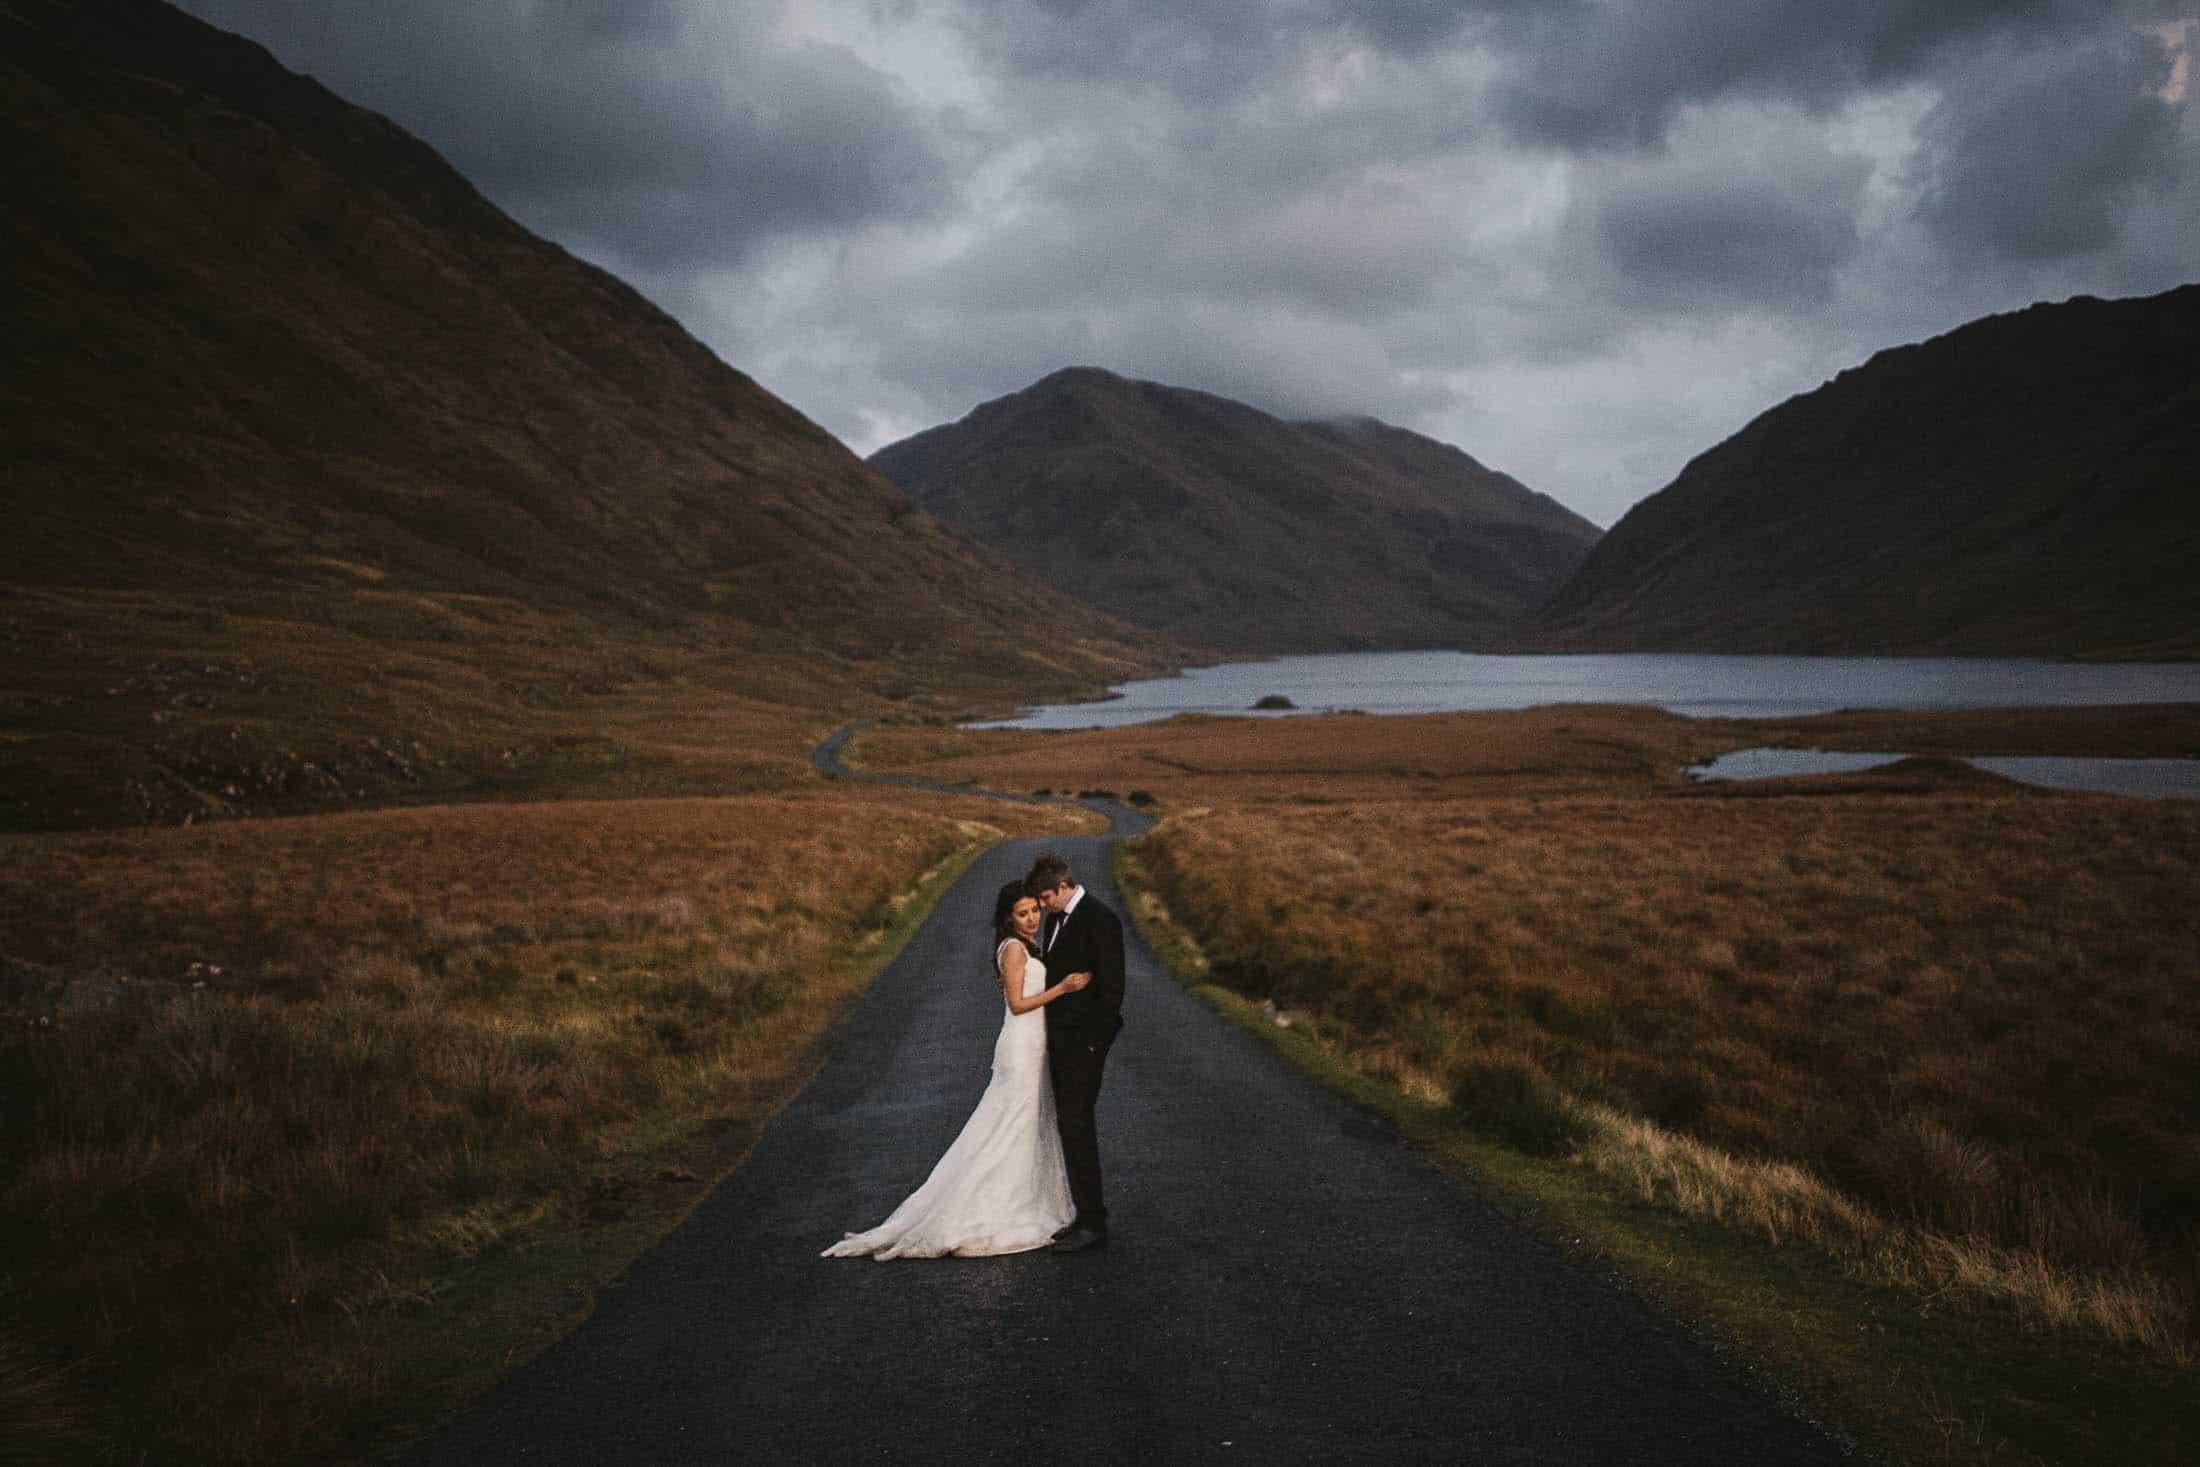 Destination Weddings Ireland Connemara Mountains and Lakes